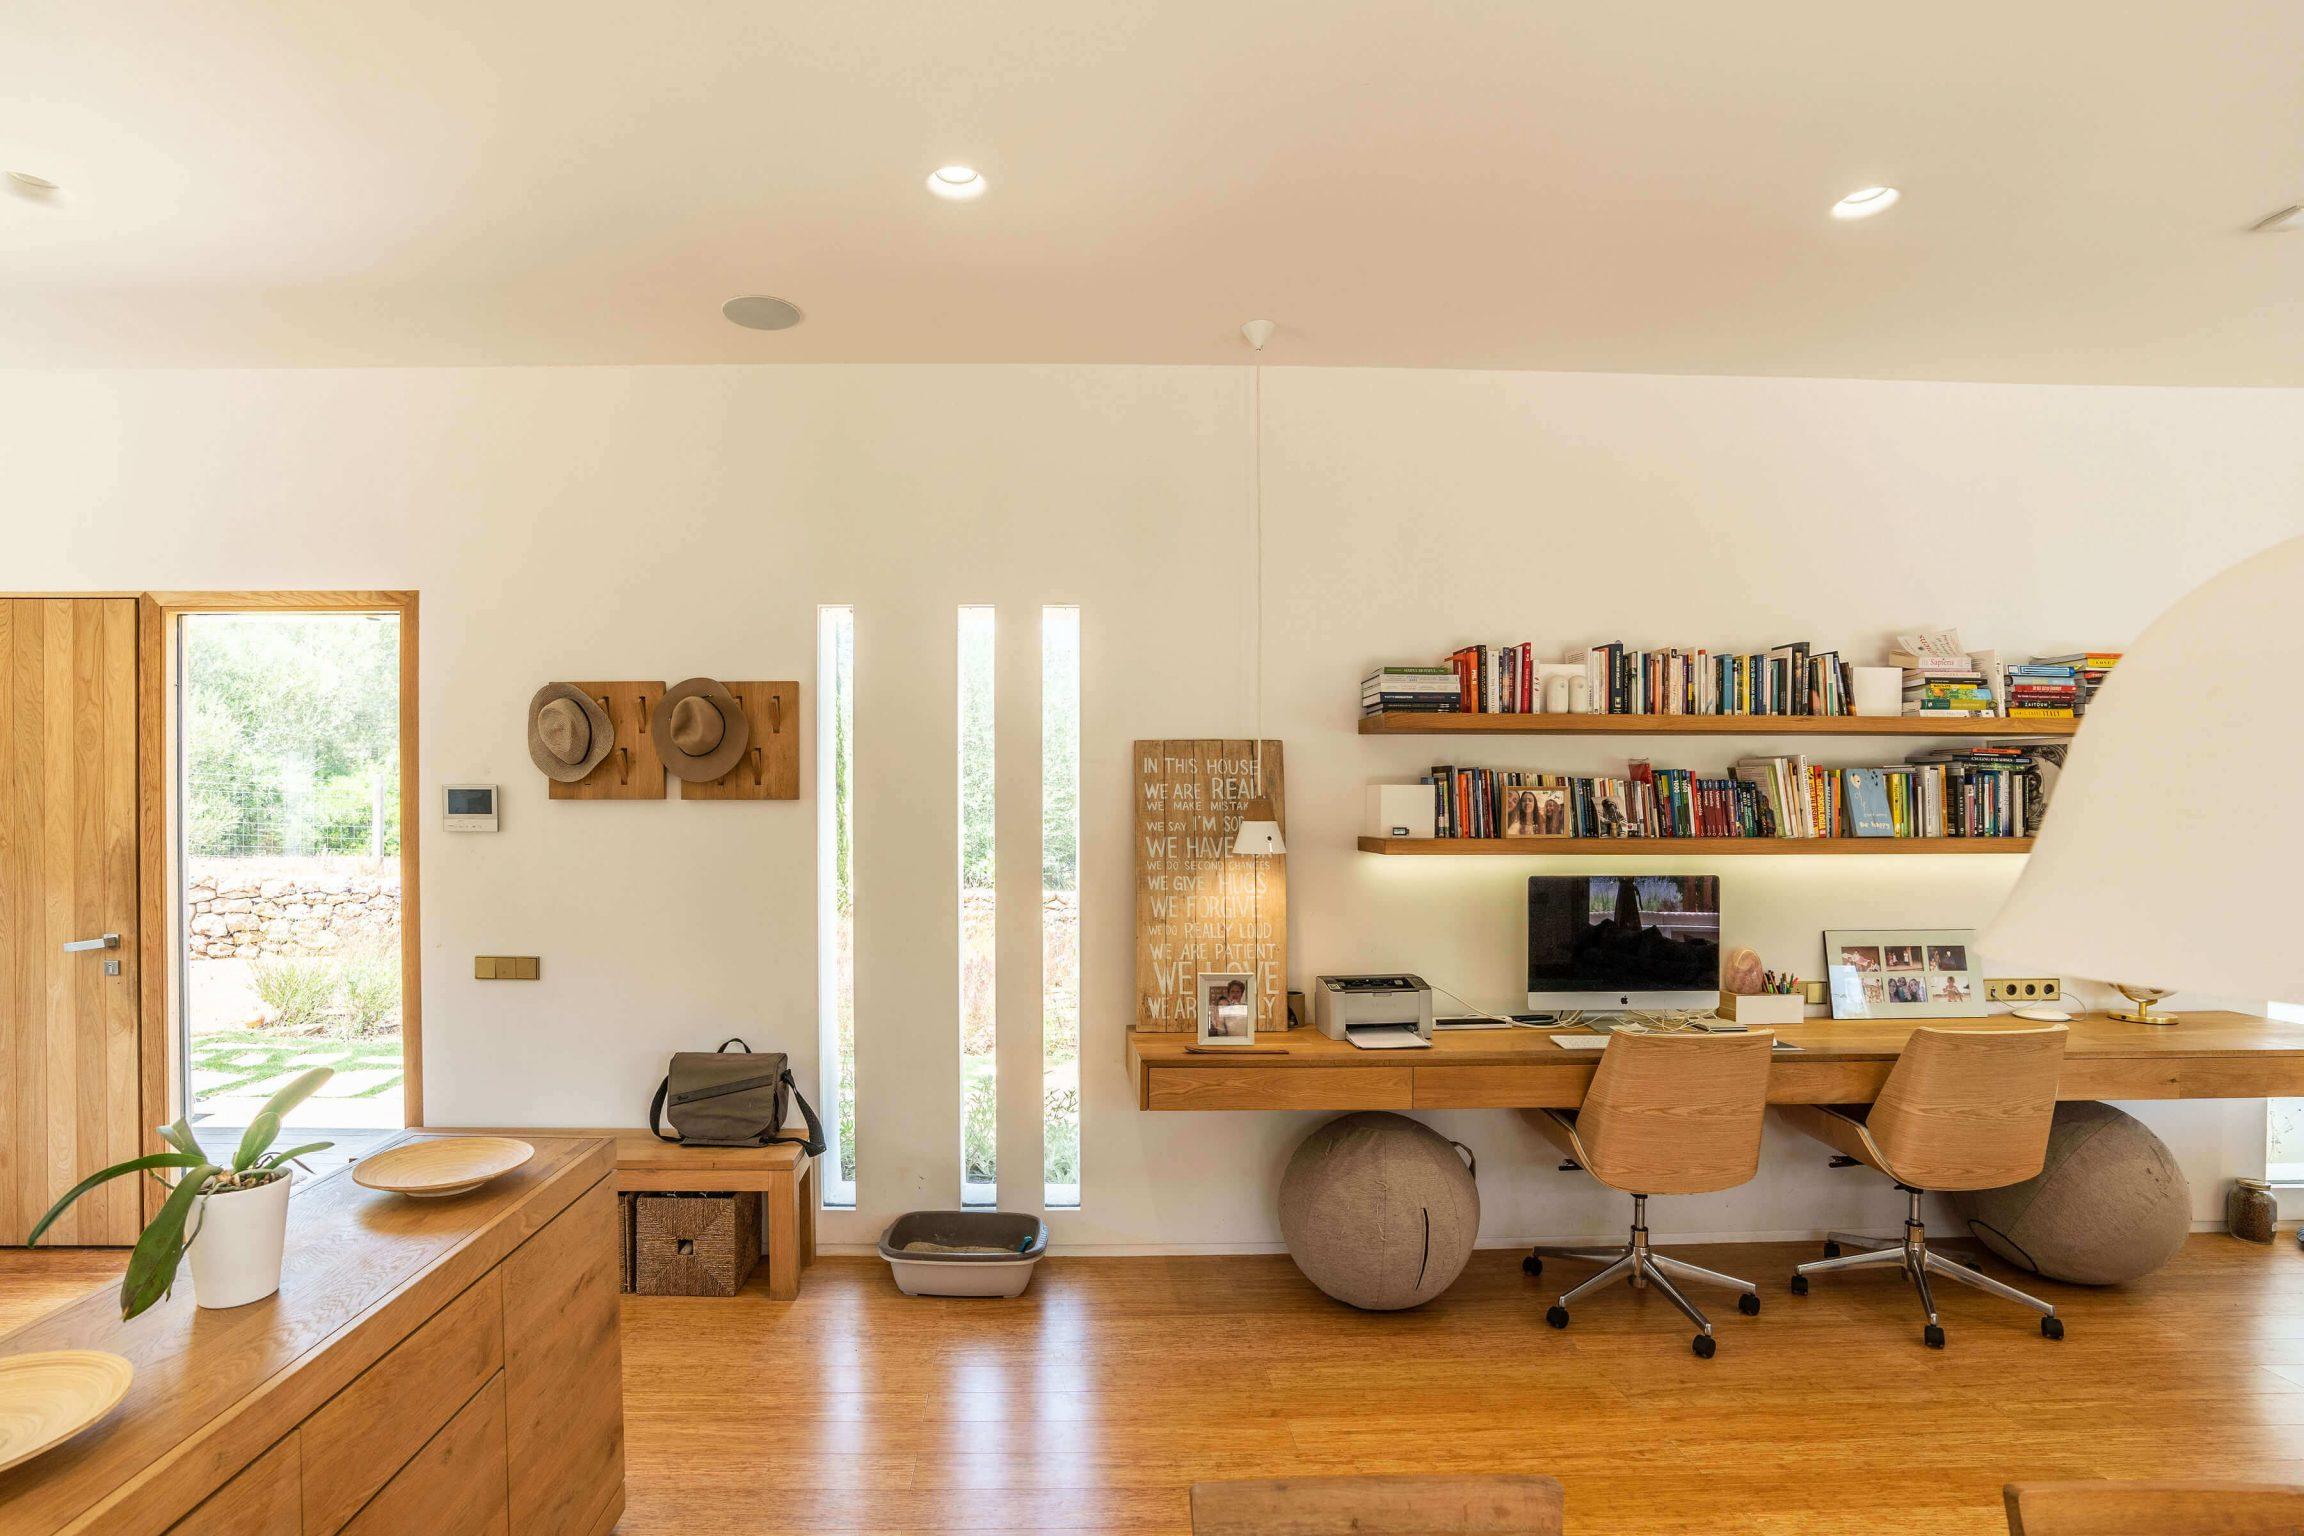 https://www.white-ibiza.com/wp-content/uploads/2021/06/white-ibiza-property-passivhaus-wi1853-40-2304x1536.jpg